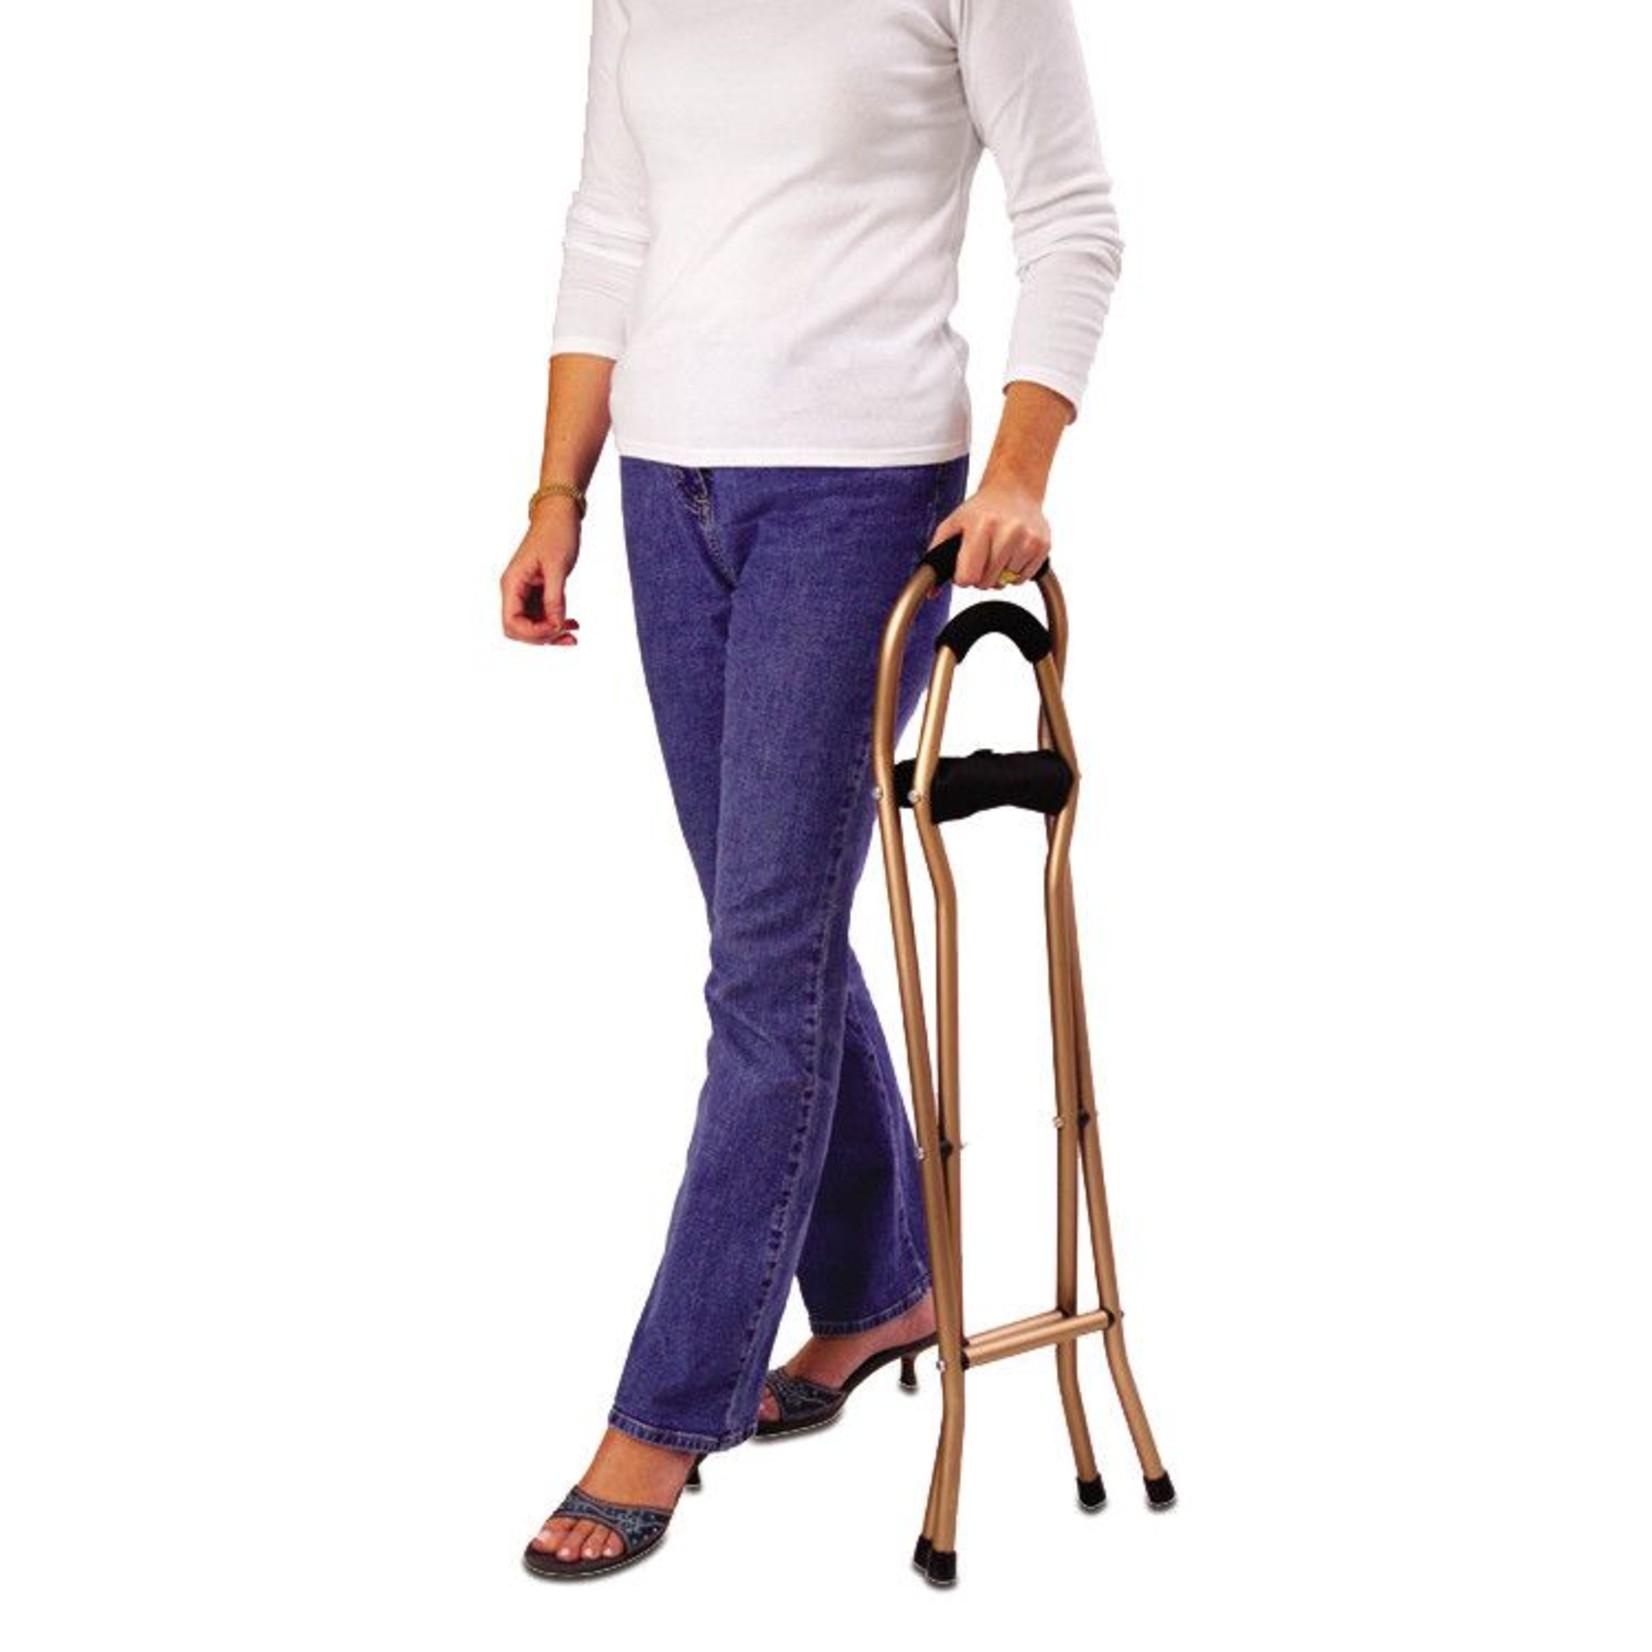 Essential Medical Seat Cane - Mesh